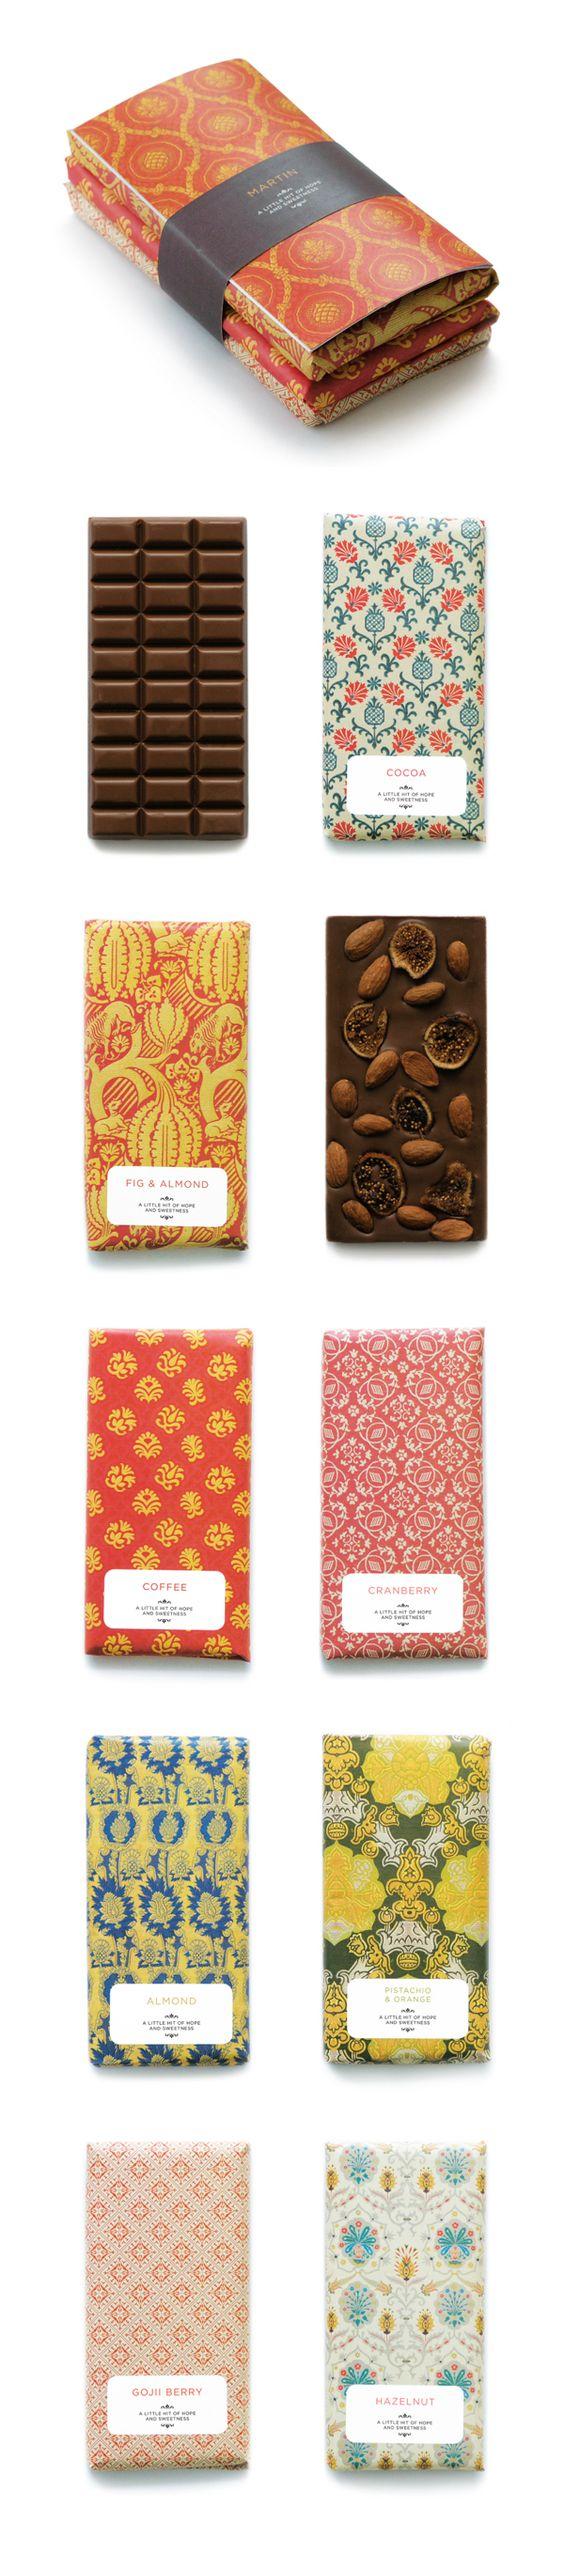 Tavolette Packaging cioccolato